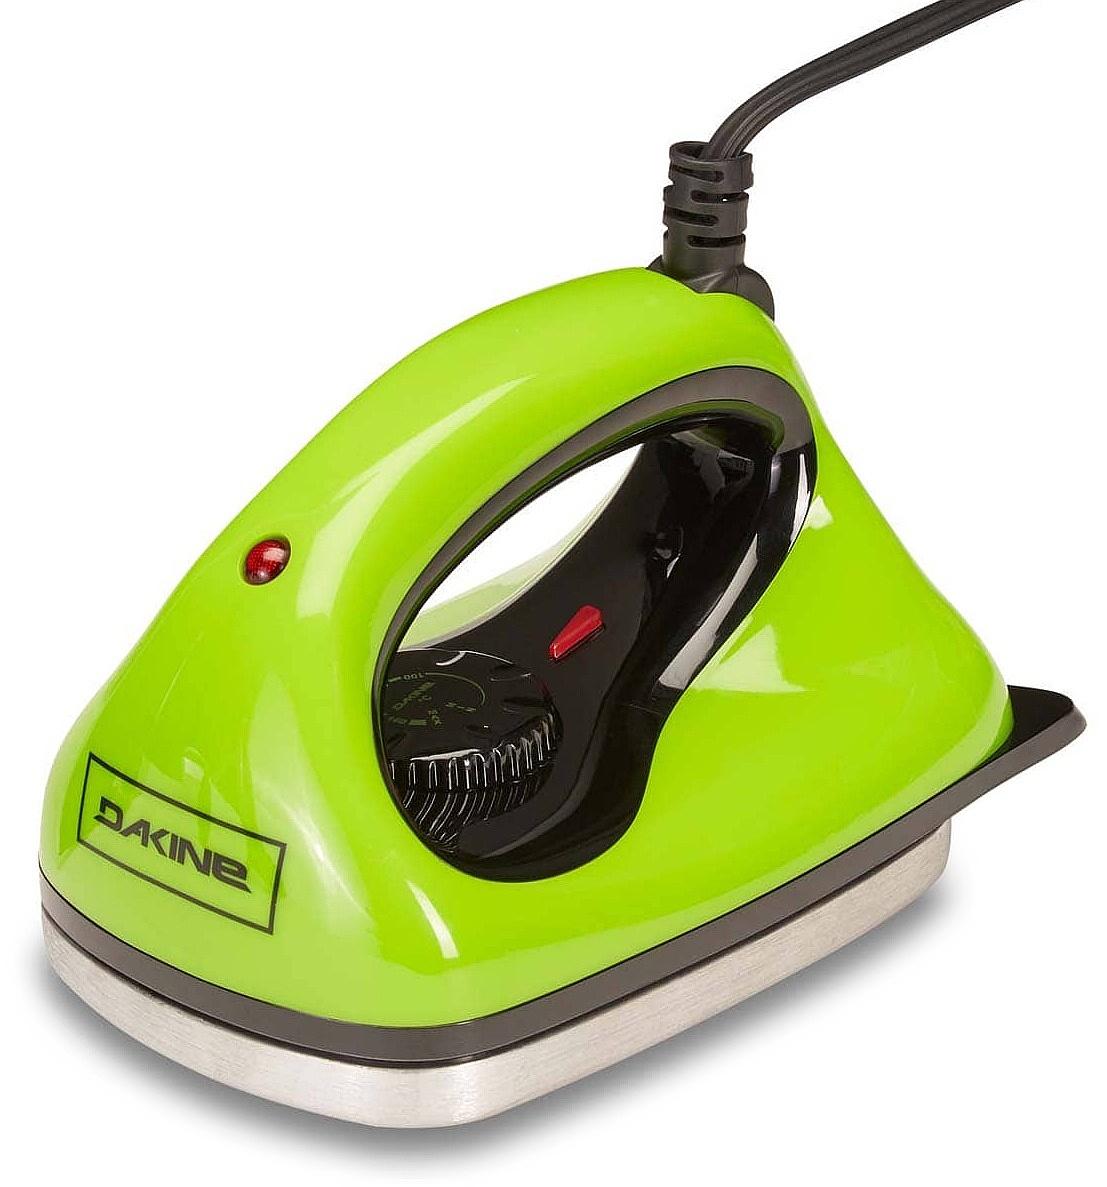 žehlička Dakine Adjustable Tuning Iron Euro - Green one size